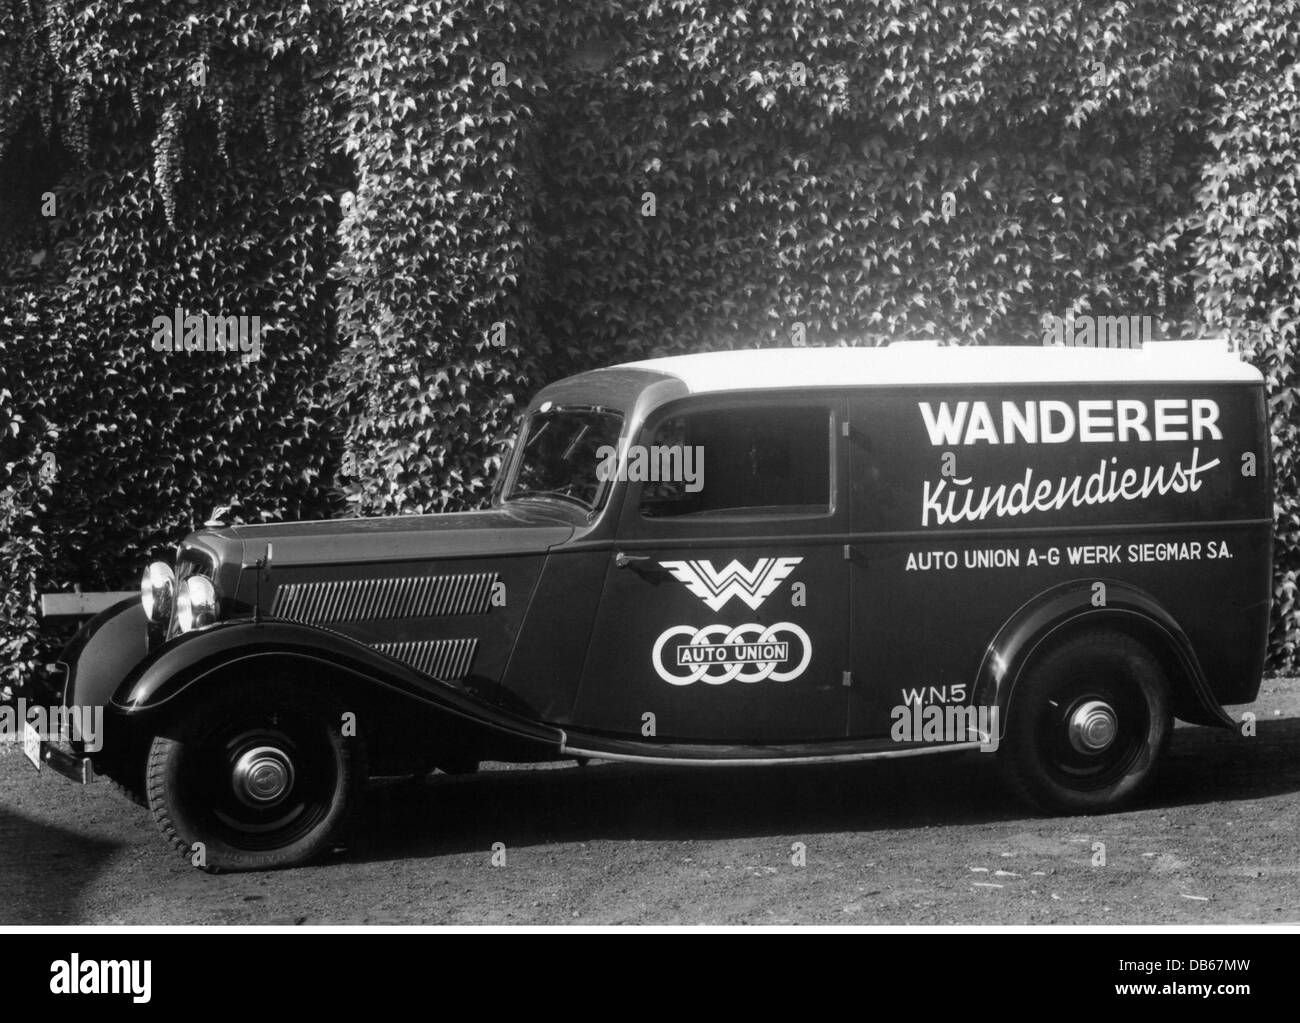 Transports / Transport, voitures, Wanderer W 22 Chariot de transport, 1932, W22, fort wagon, voiture, Allemagne, Photo Stock